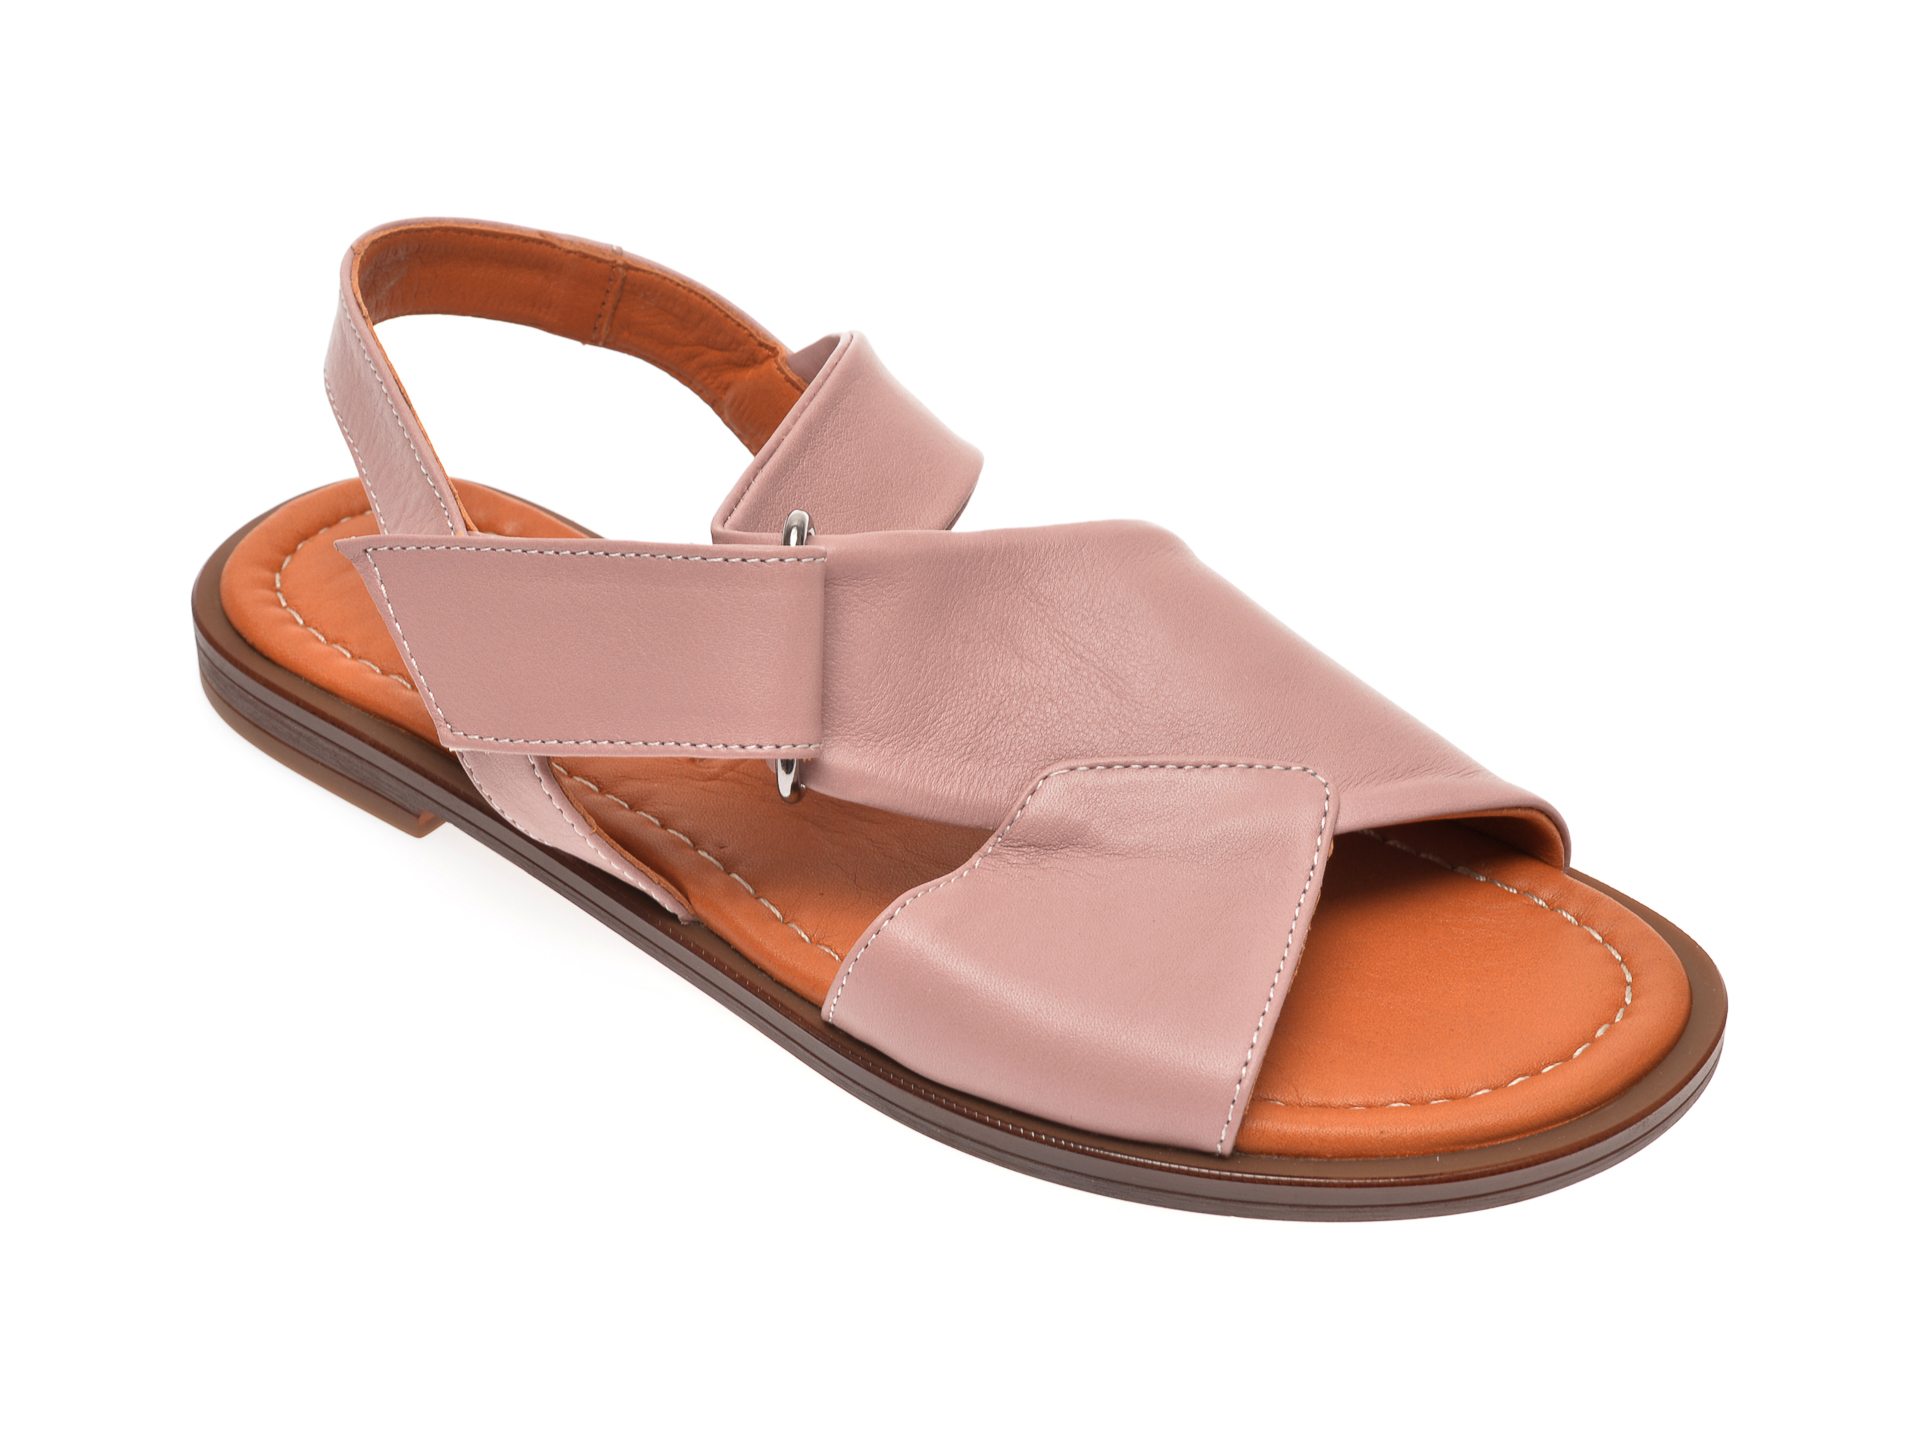 Sandale FLAVIA PASSINI mov, 0021673, din piele naturala